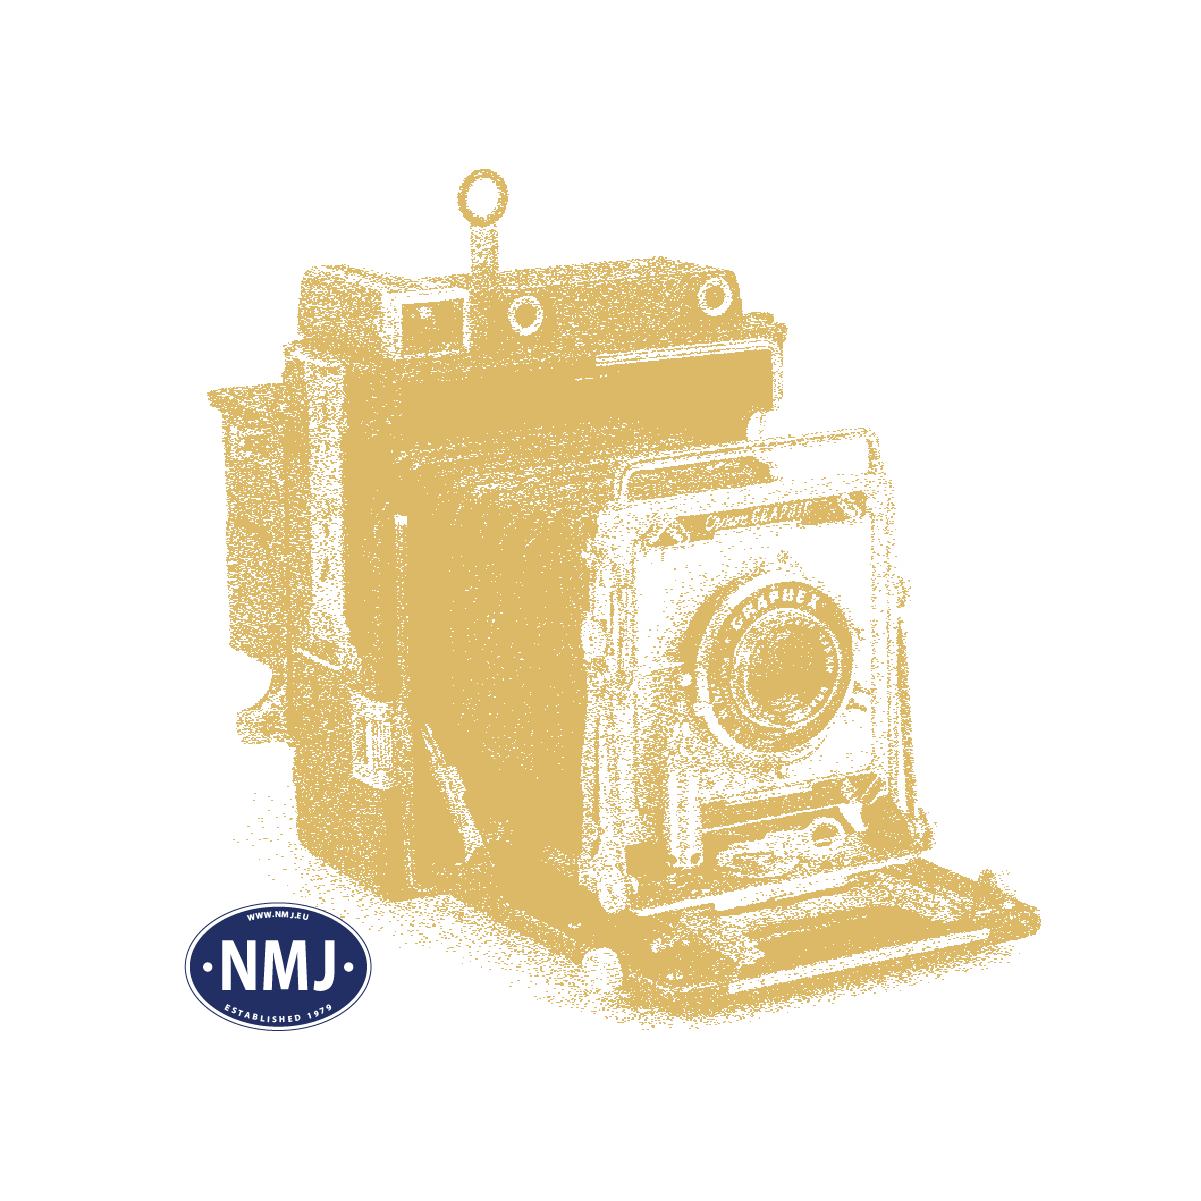 NMJT204.002 - NMJ Topline SJ B1.4816, 2 Cl. Passenger coach, old SJ logo